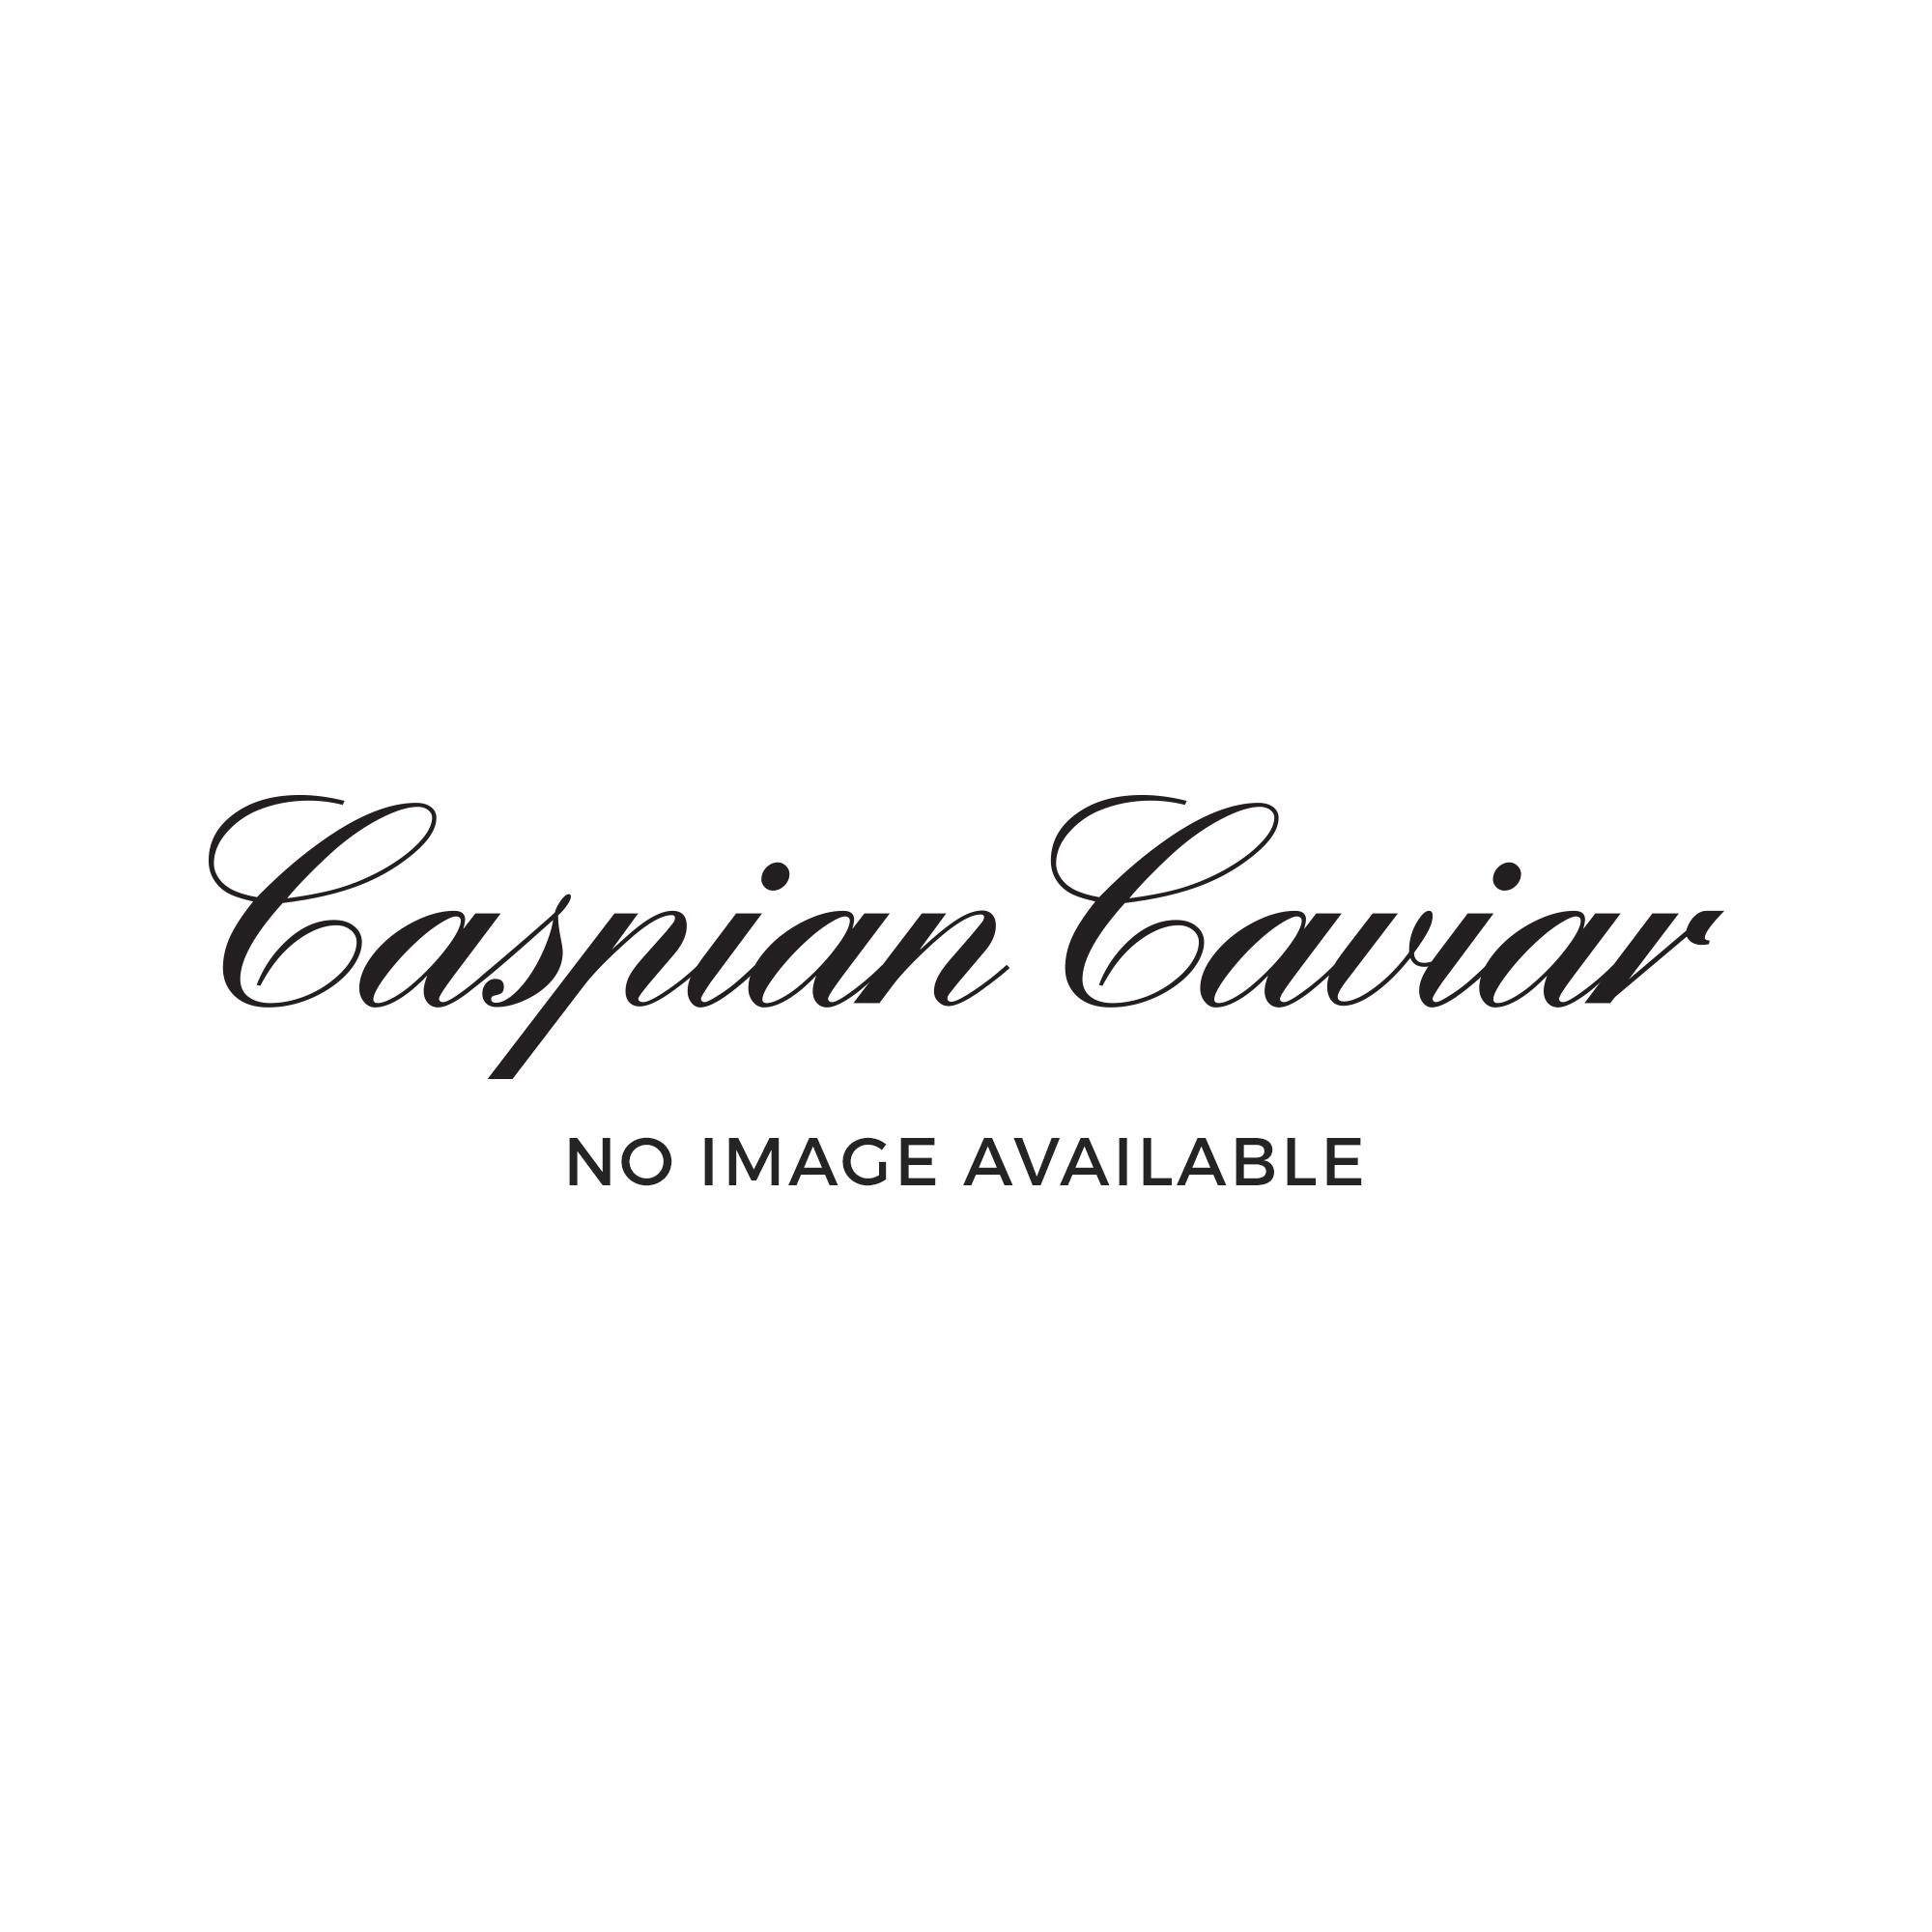 Caspian Caviar Vodka and Oscietra Caviar Gift Box 30g or 50g